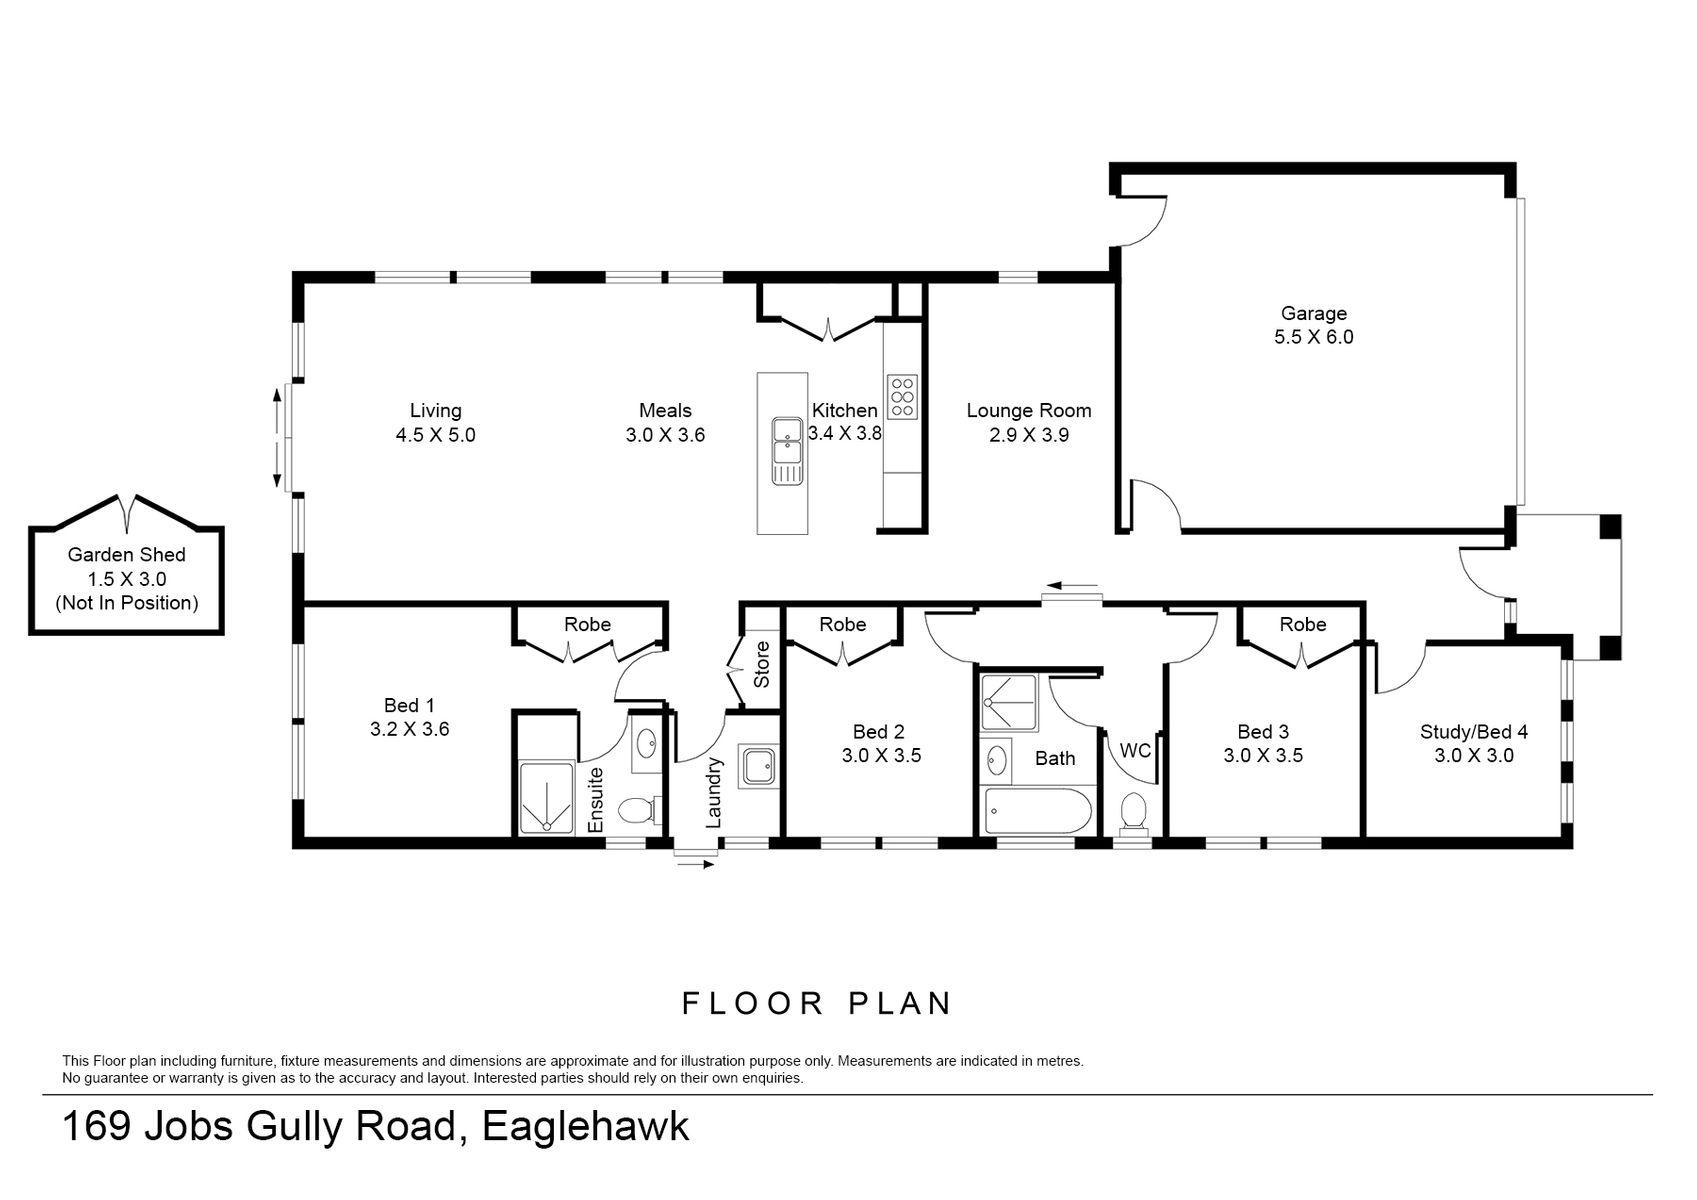 169 Jobs Gully Road, Eaglehawk, VIC 3556